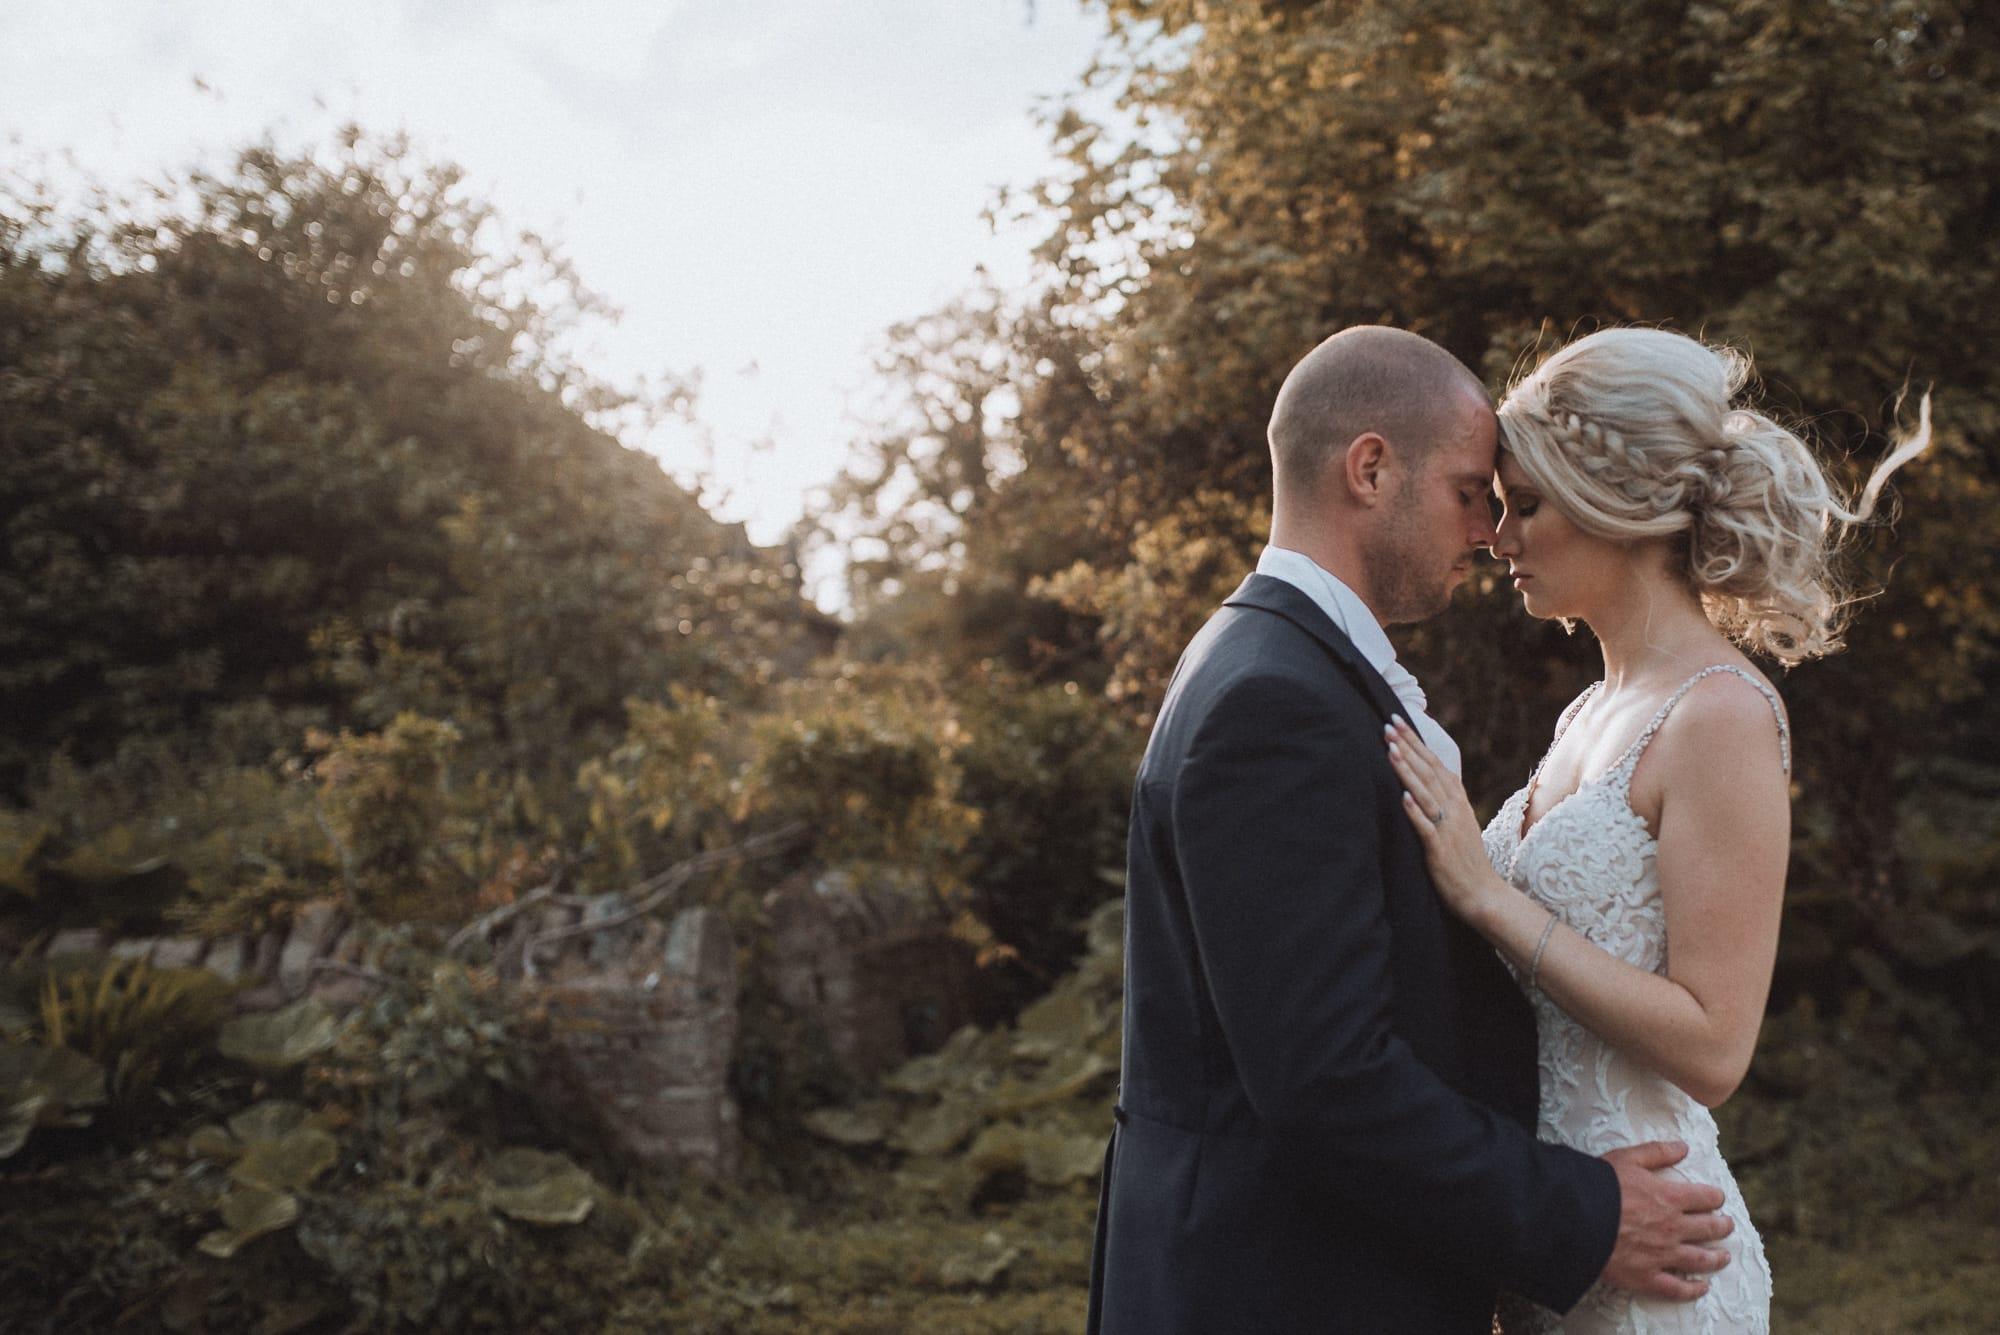 Couples Portraits Sunset Summer Wedding Photographer Tianna J-Williams Photography